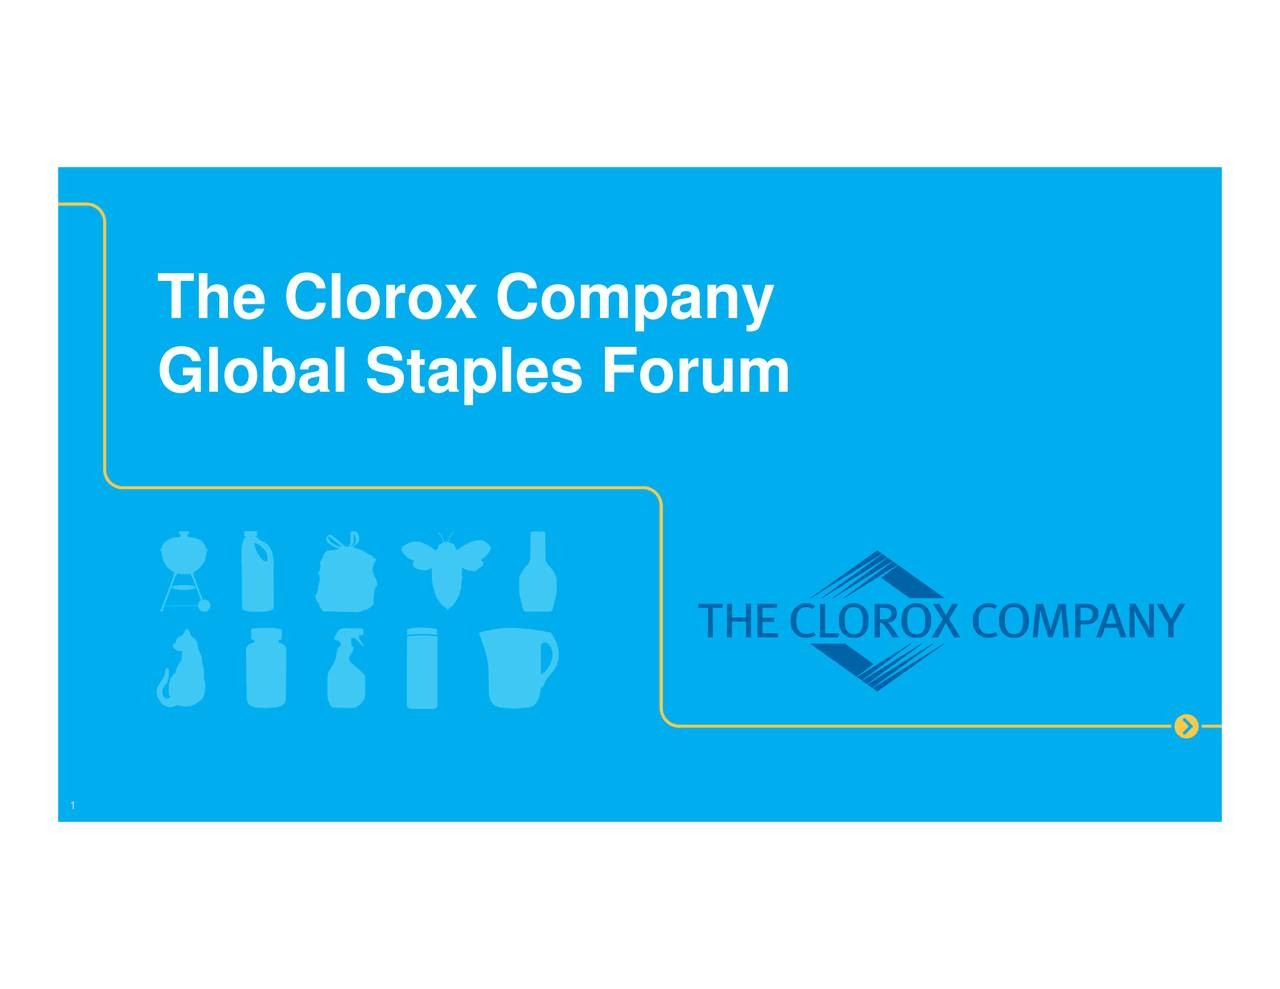 Clorox (CLX) Presents At Goldman Sachs Global Staples Forum